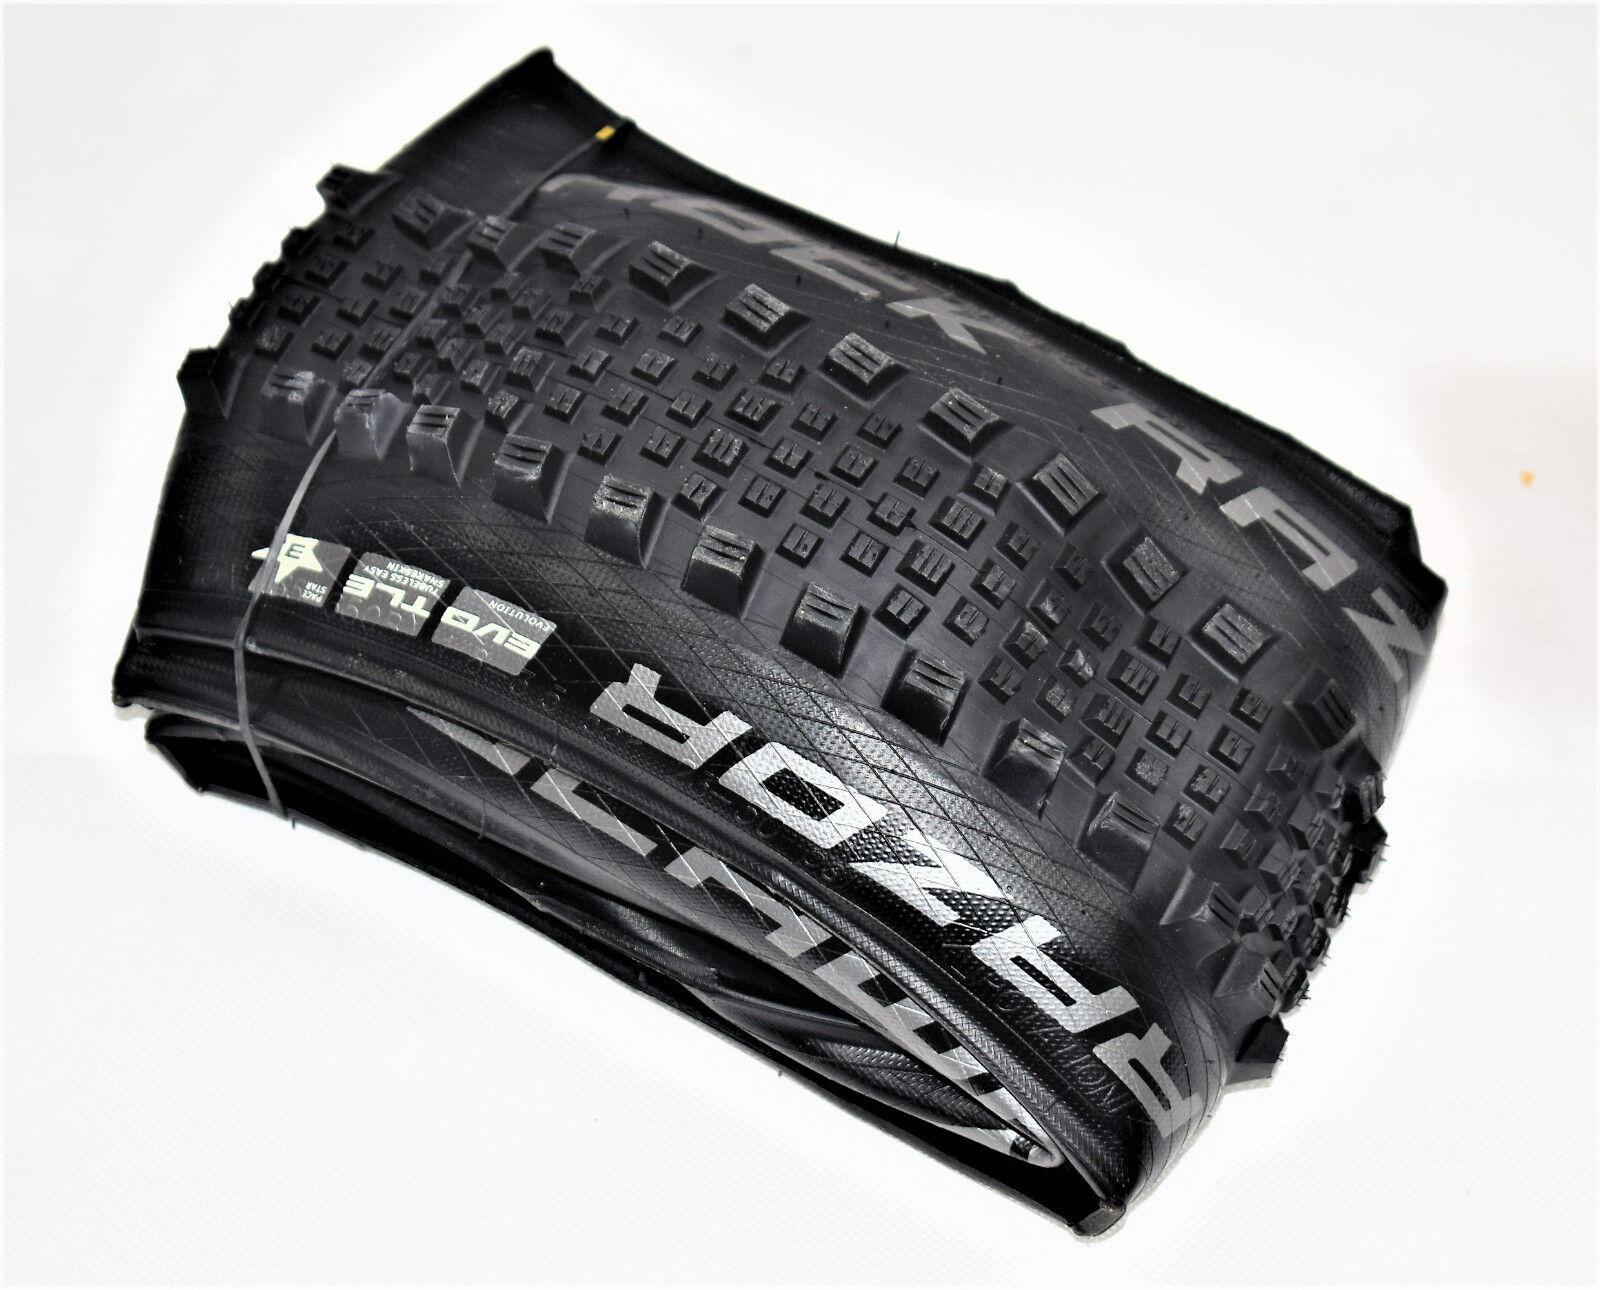 Bicycle Tyres Schwalbe Skirt Razor Tle Evo 27,5x2,35 Snakeskin pace Star R024